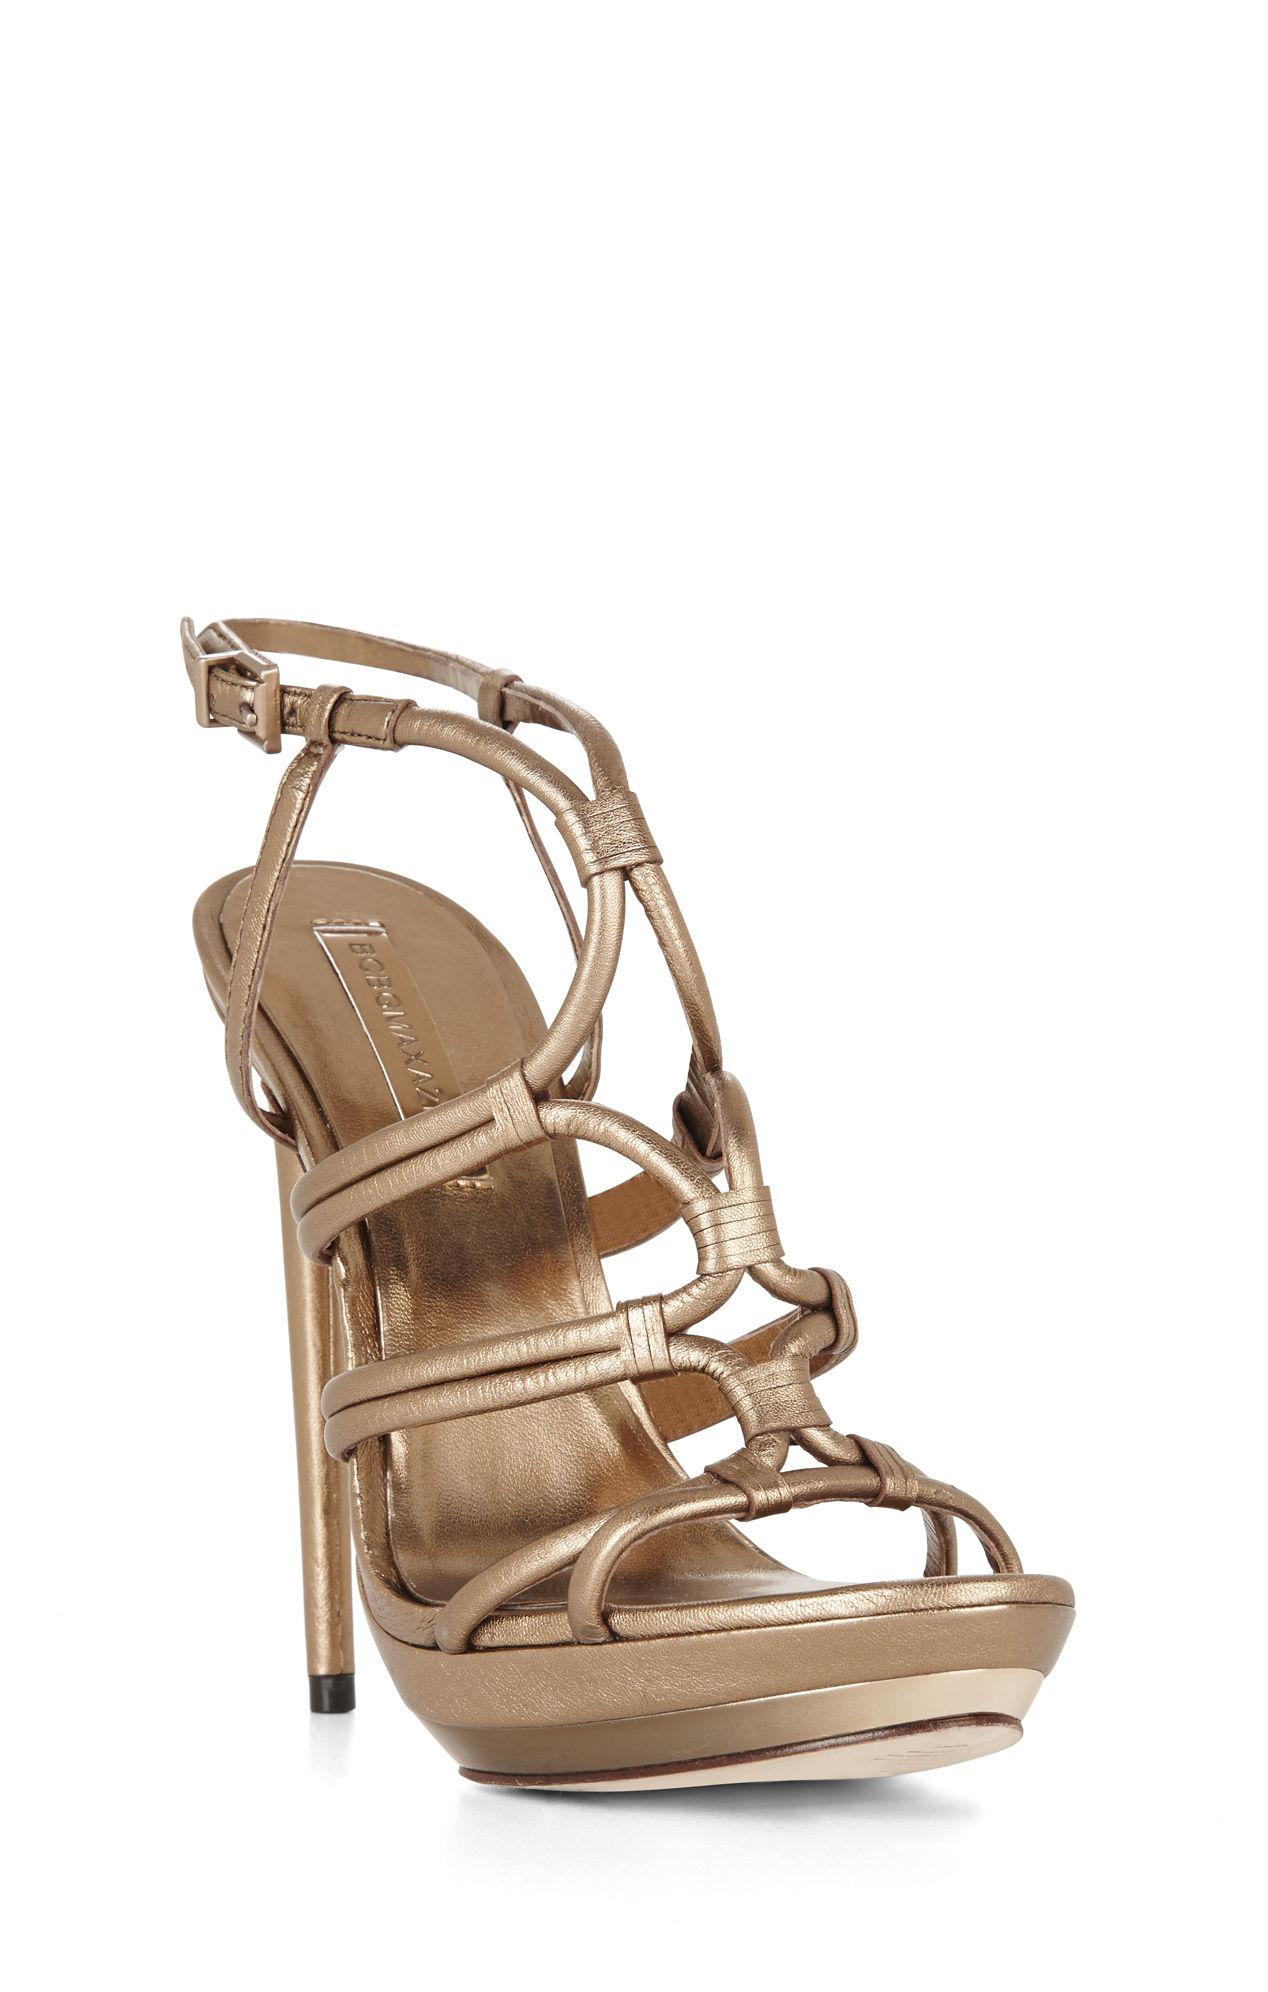 8605189b4 Lyst - BCBGMAXAZRIA Farrow High-heel Strappy Dress Sandal in Brown